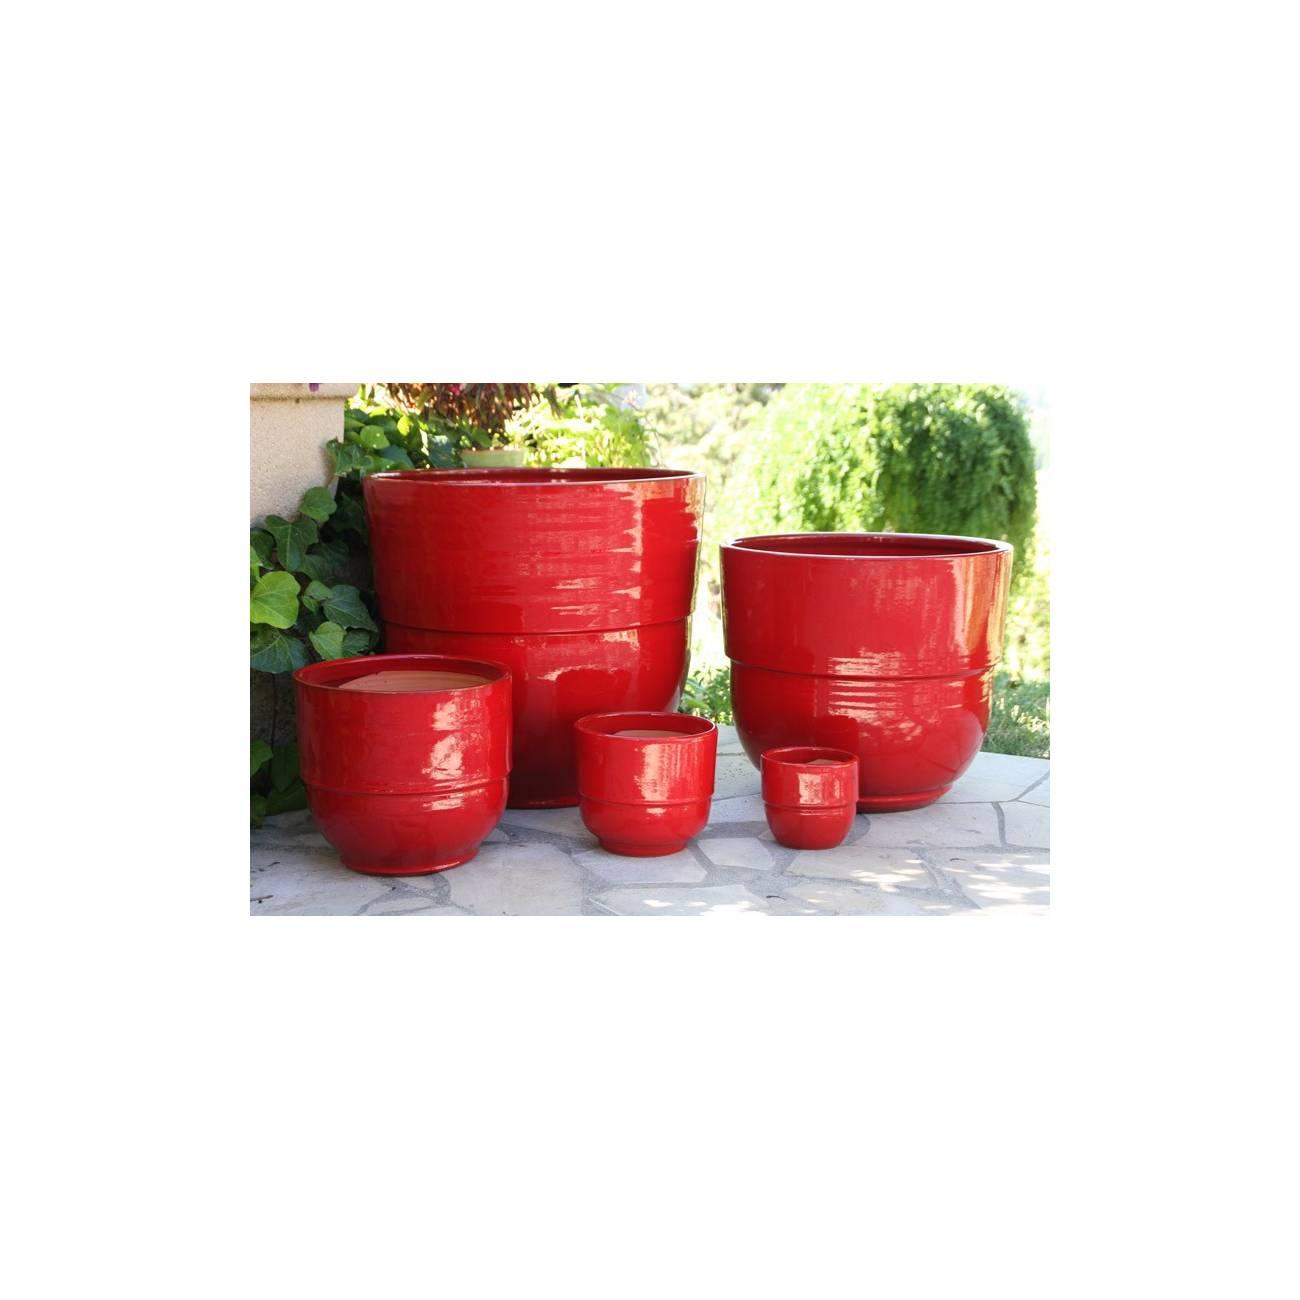 pot et vase droit vase rebord collection coquelicot. Black Bedroom Furniture Sets. Home Design Ideas